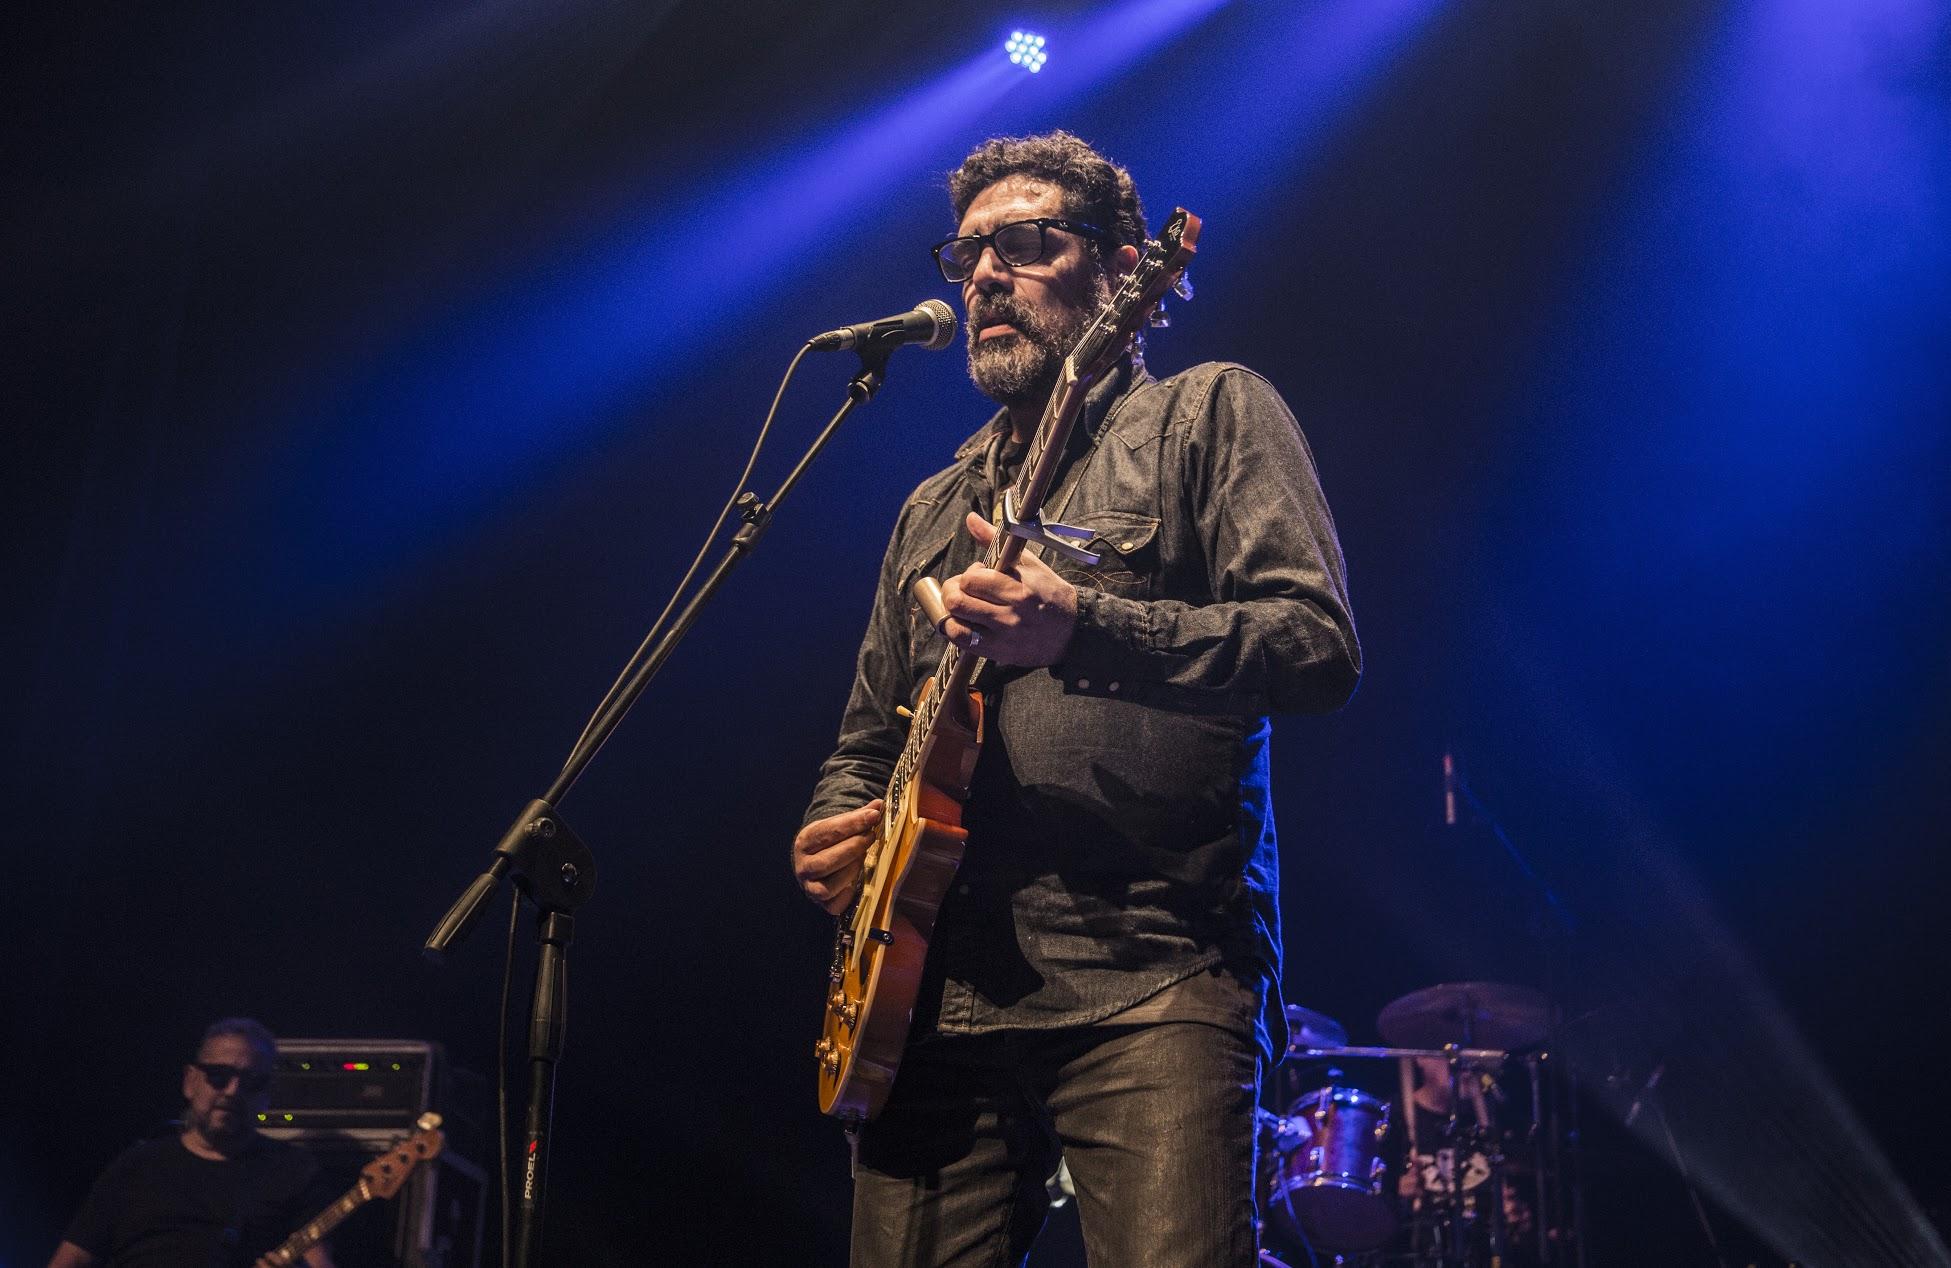 Sonido Vivo: Entrevista exclusiva con Ricardo Tapia - Radio Cantilo